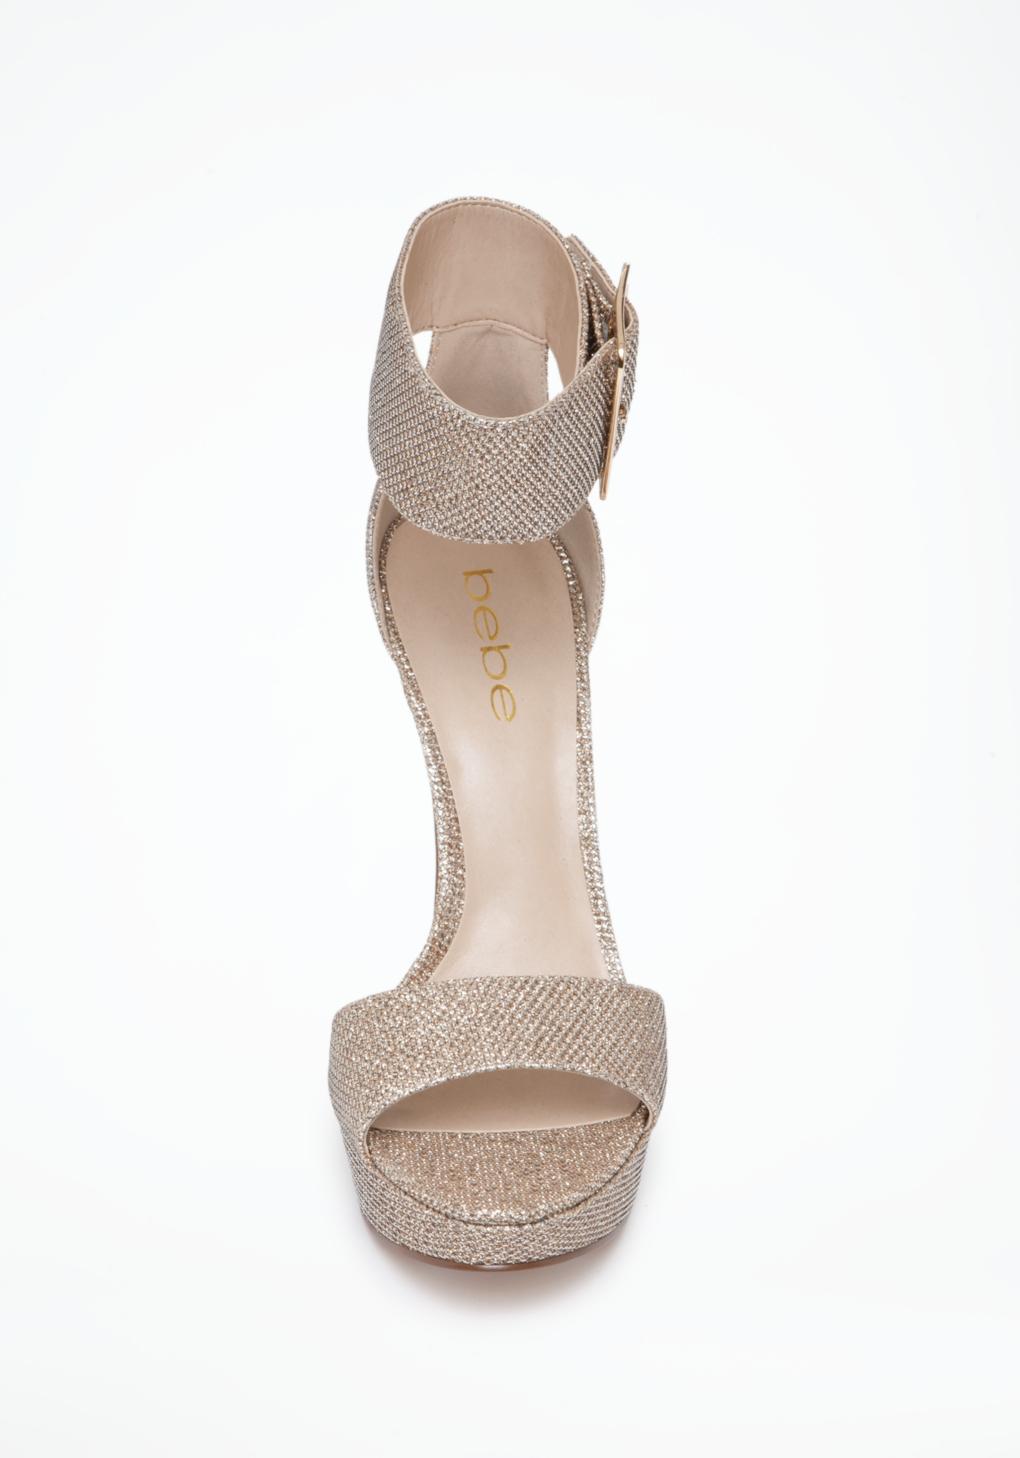 87e0189596a Bebe Jill Glitter Mesh Ankle Sandals in Natural - Lyst